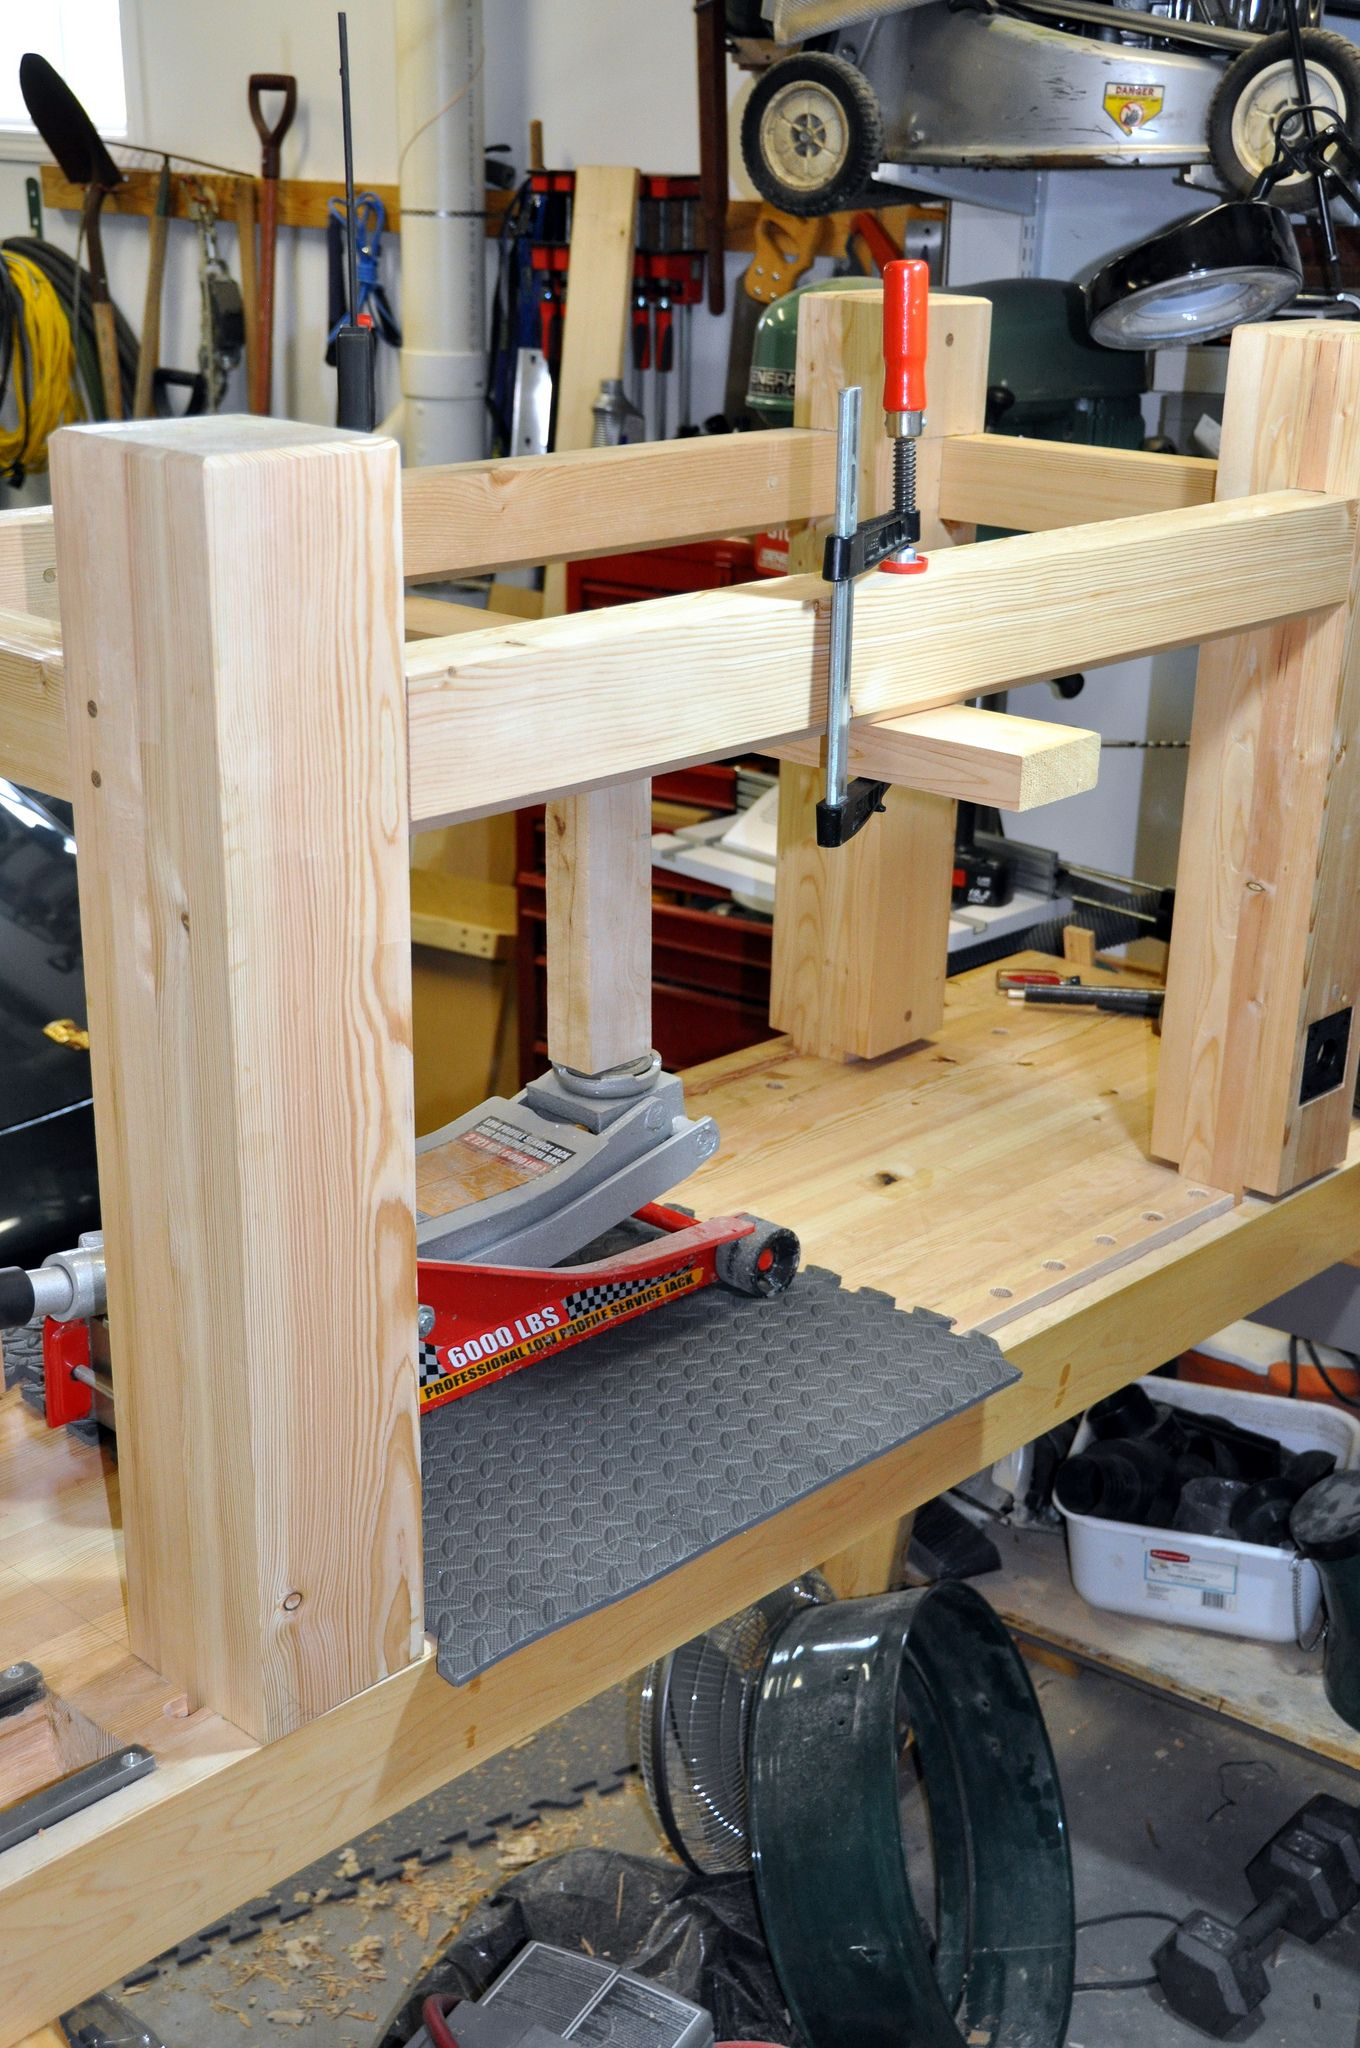 11+ Wood craft ideas to make money ideas in 2021